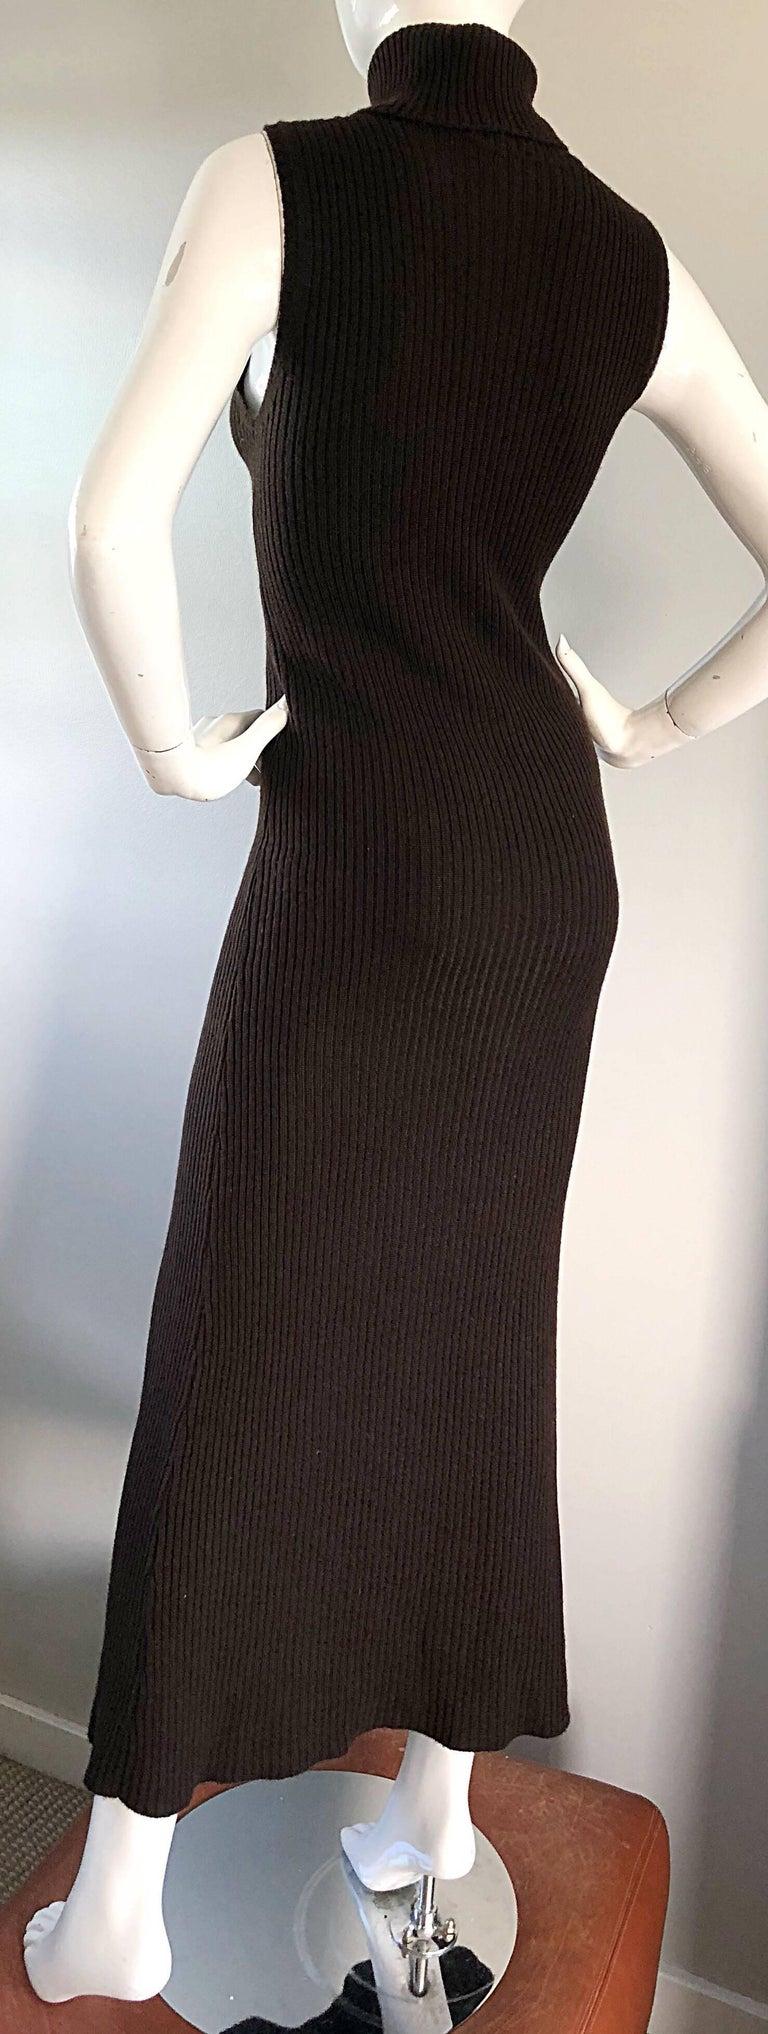 Chanel Vintage 99A Espresso Brown Cashmere Turtleneck 1990s 90s Sweater Dress 8